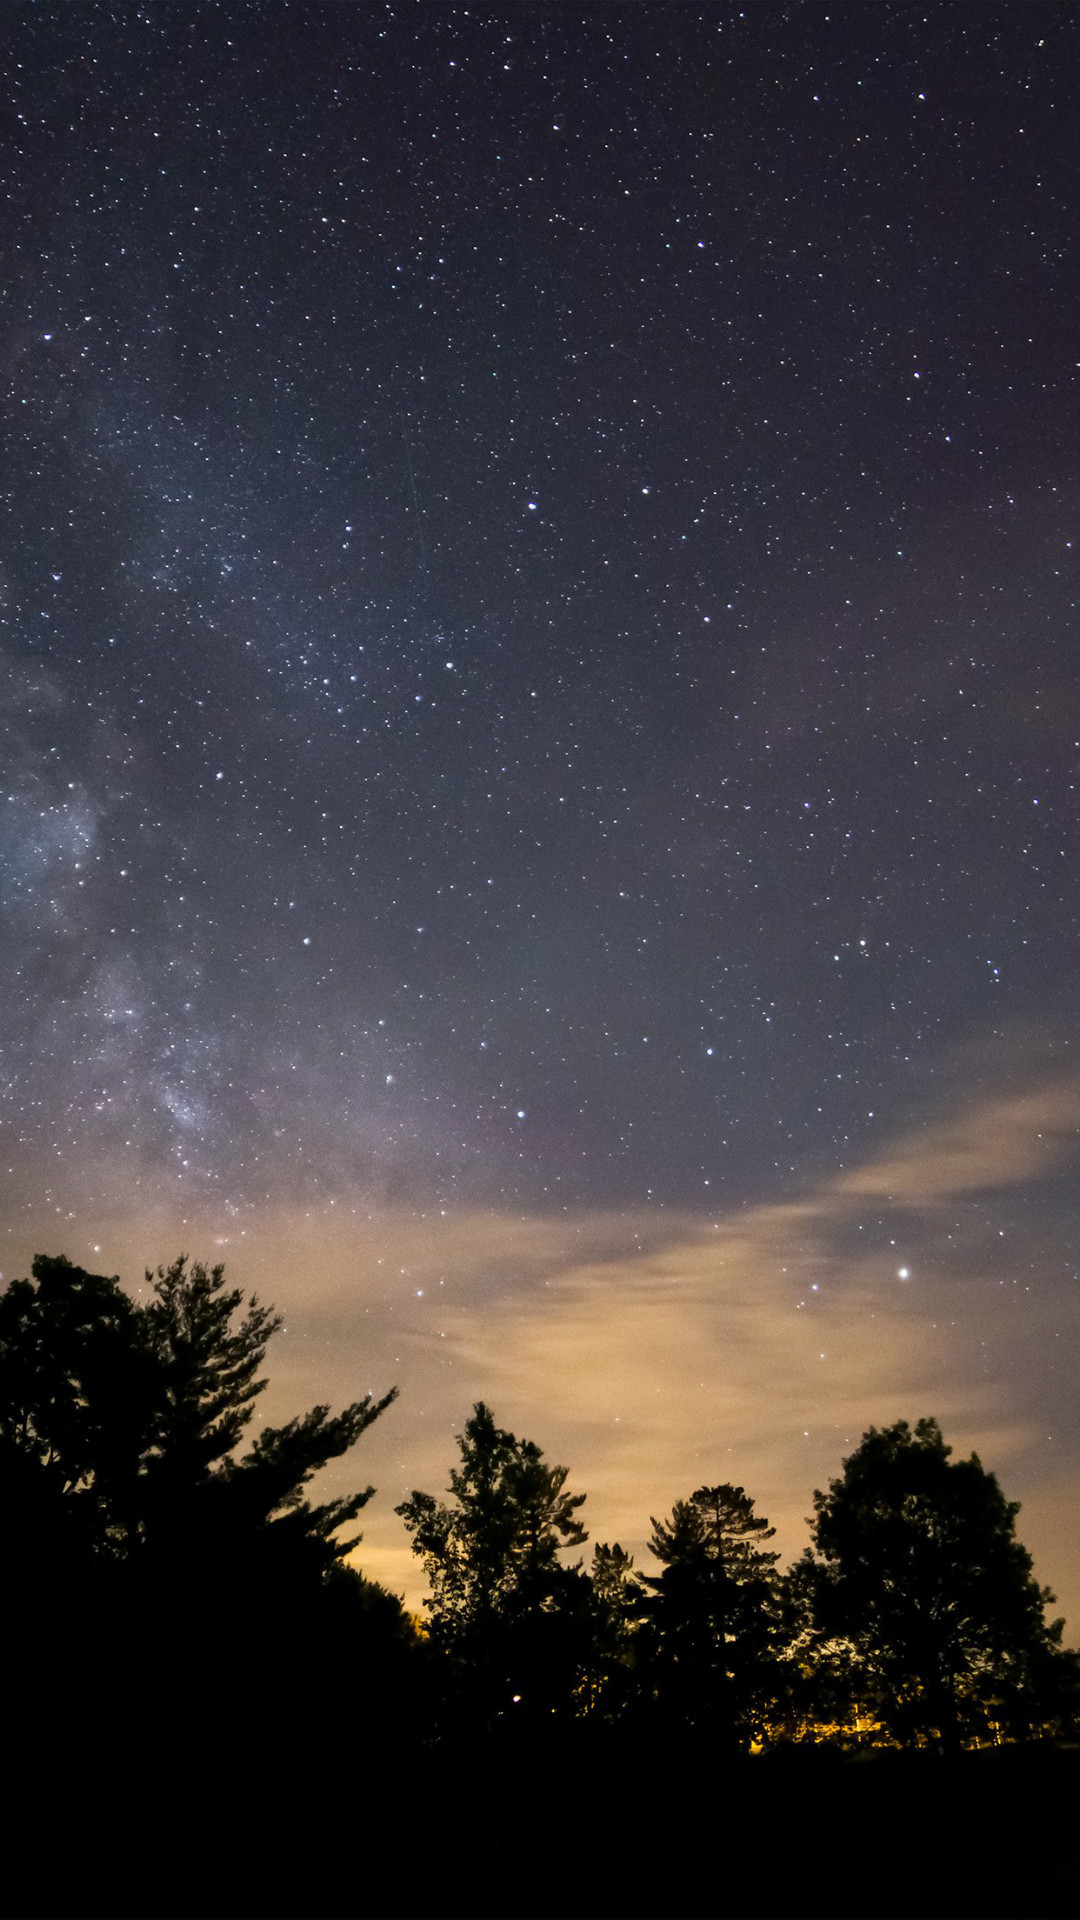 Sky Night Star Dark Mountain Cloud Shadow iPhone 6 wallpaper